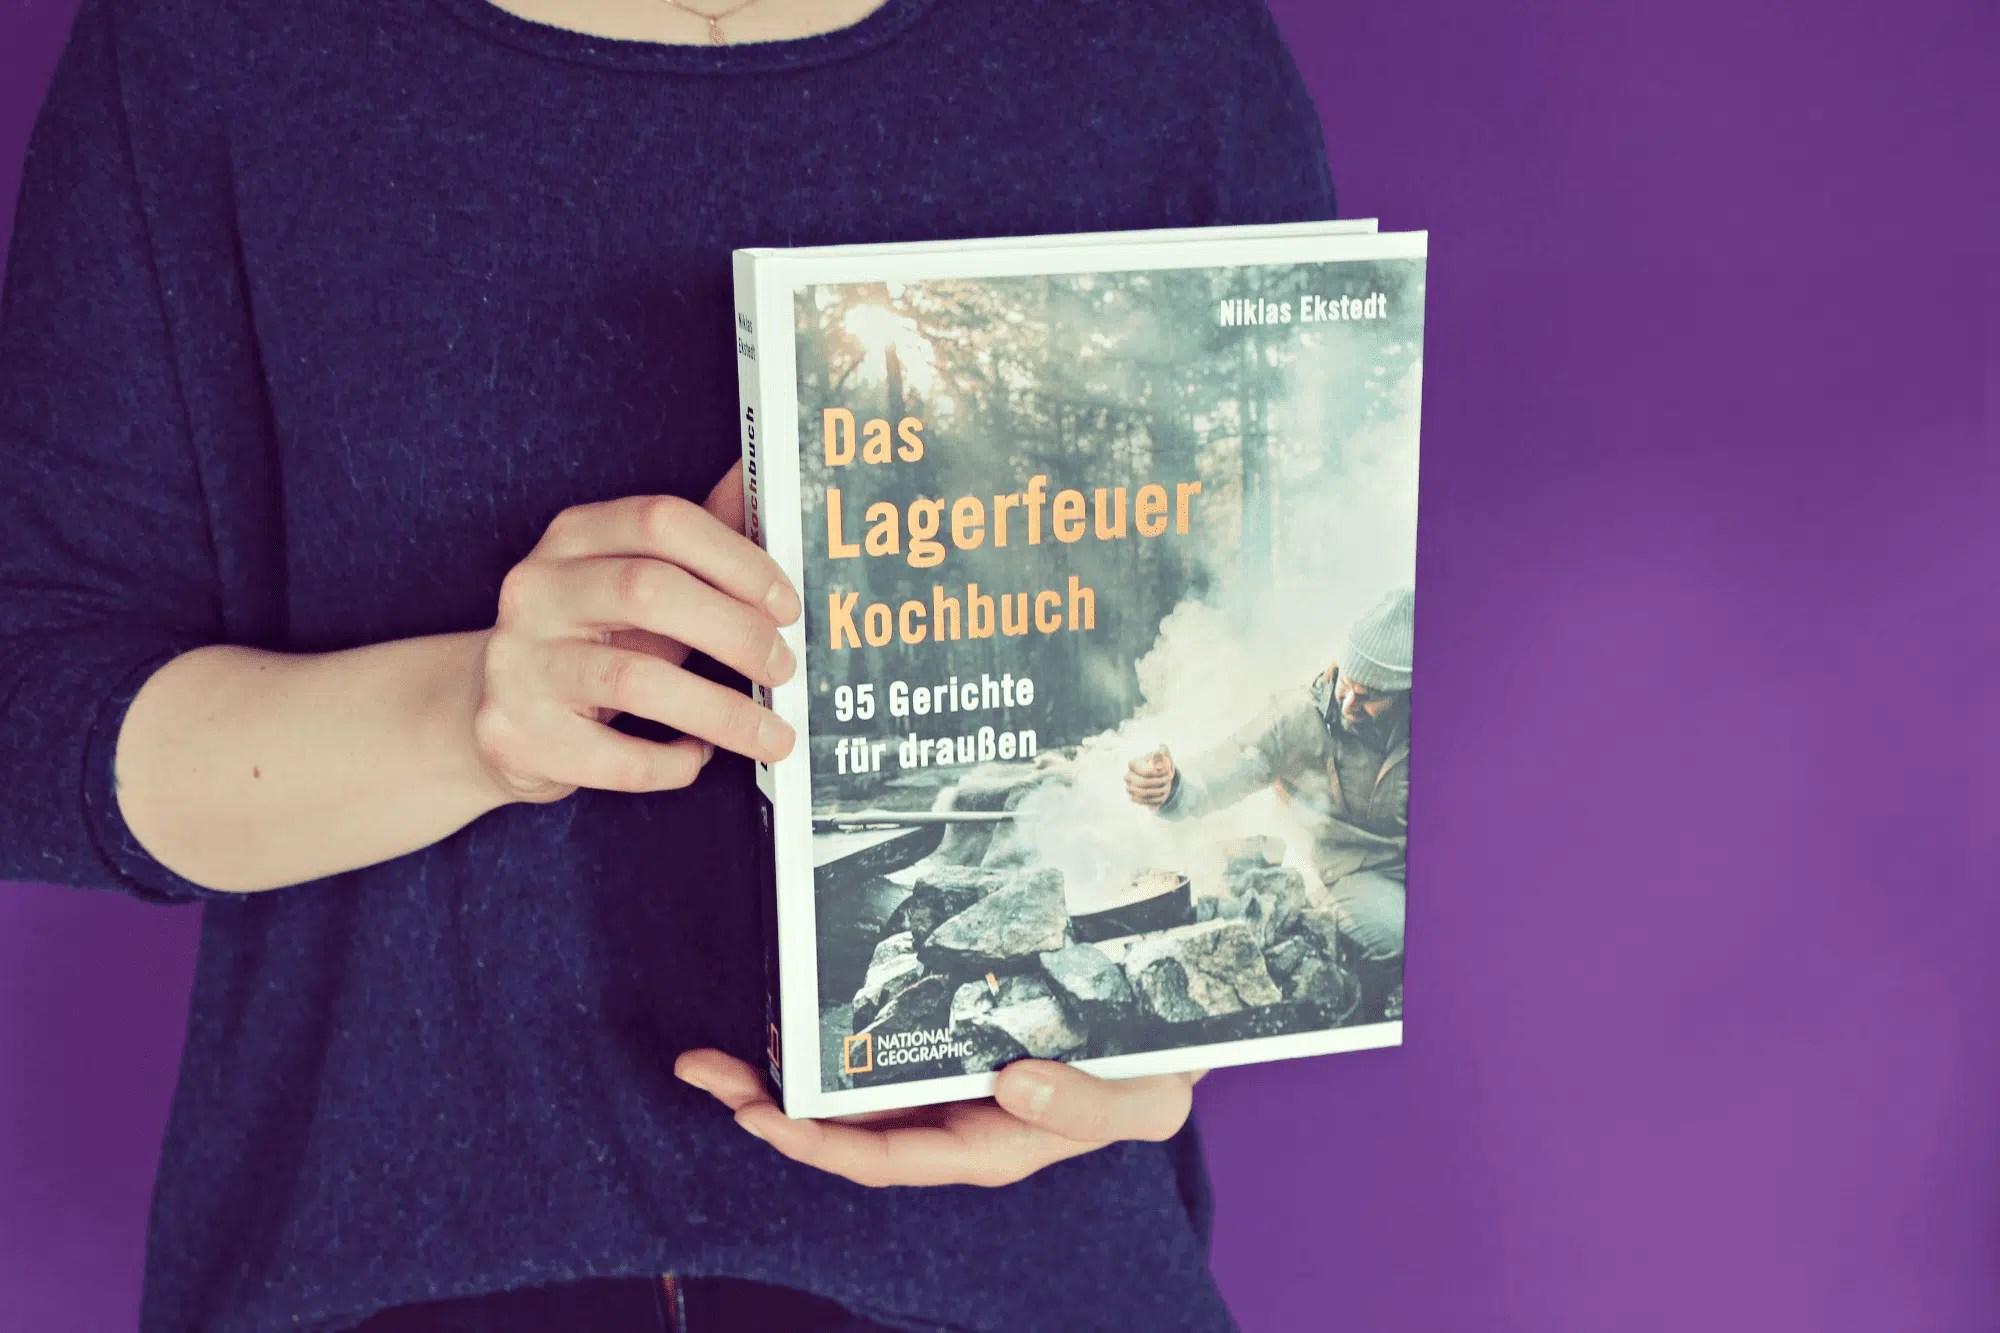 Das Lagerfeuer Kochbuch: Niklas Ekstedt | Miomente Entdeckermagazin